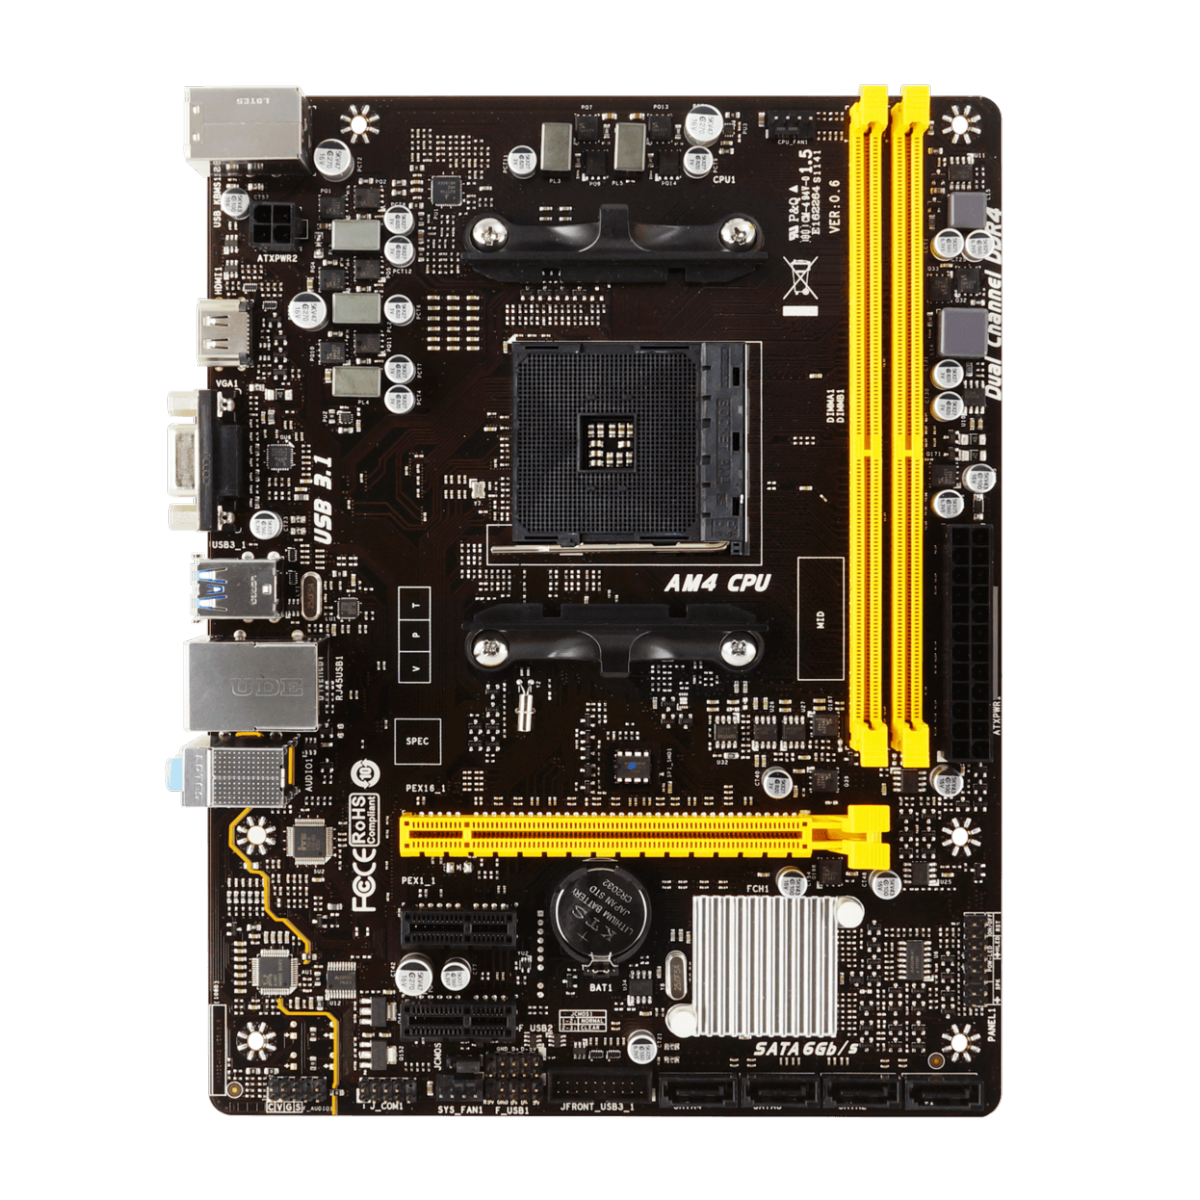 Kit Upgrade Biostar GeForce GT 610 2GB + Ryzen 3 3300x + Biostar A320MH + Cooler de Brinde